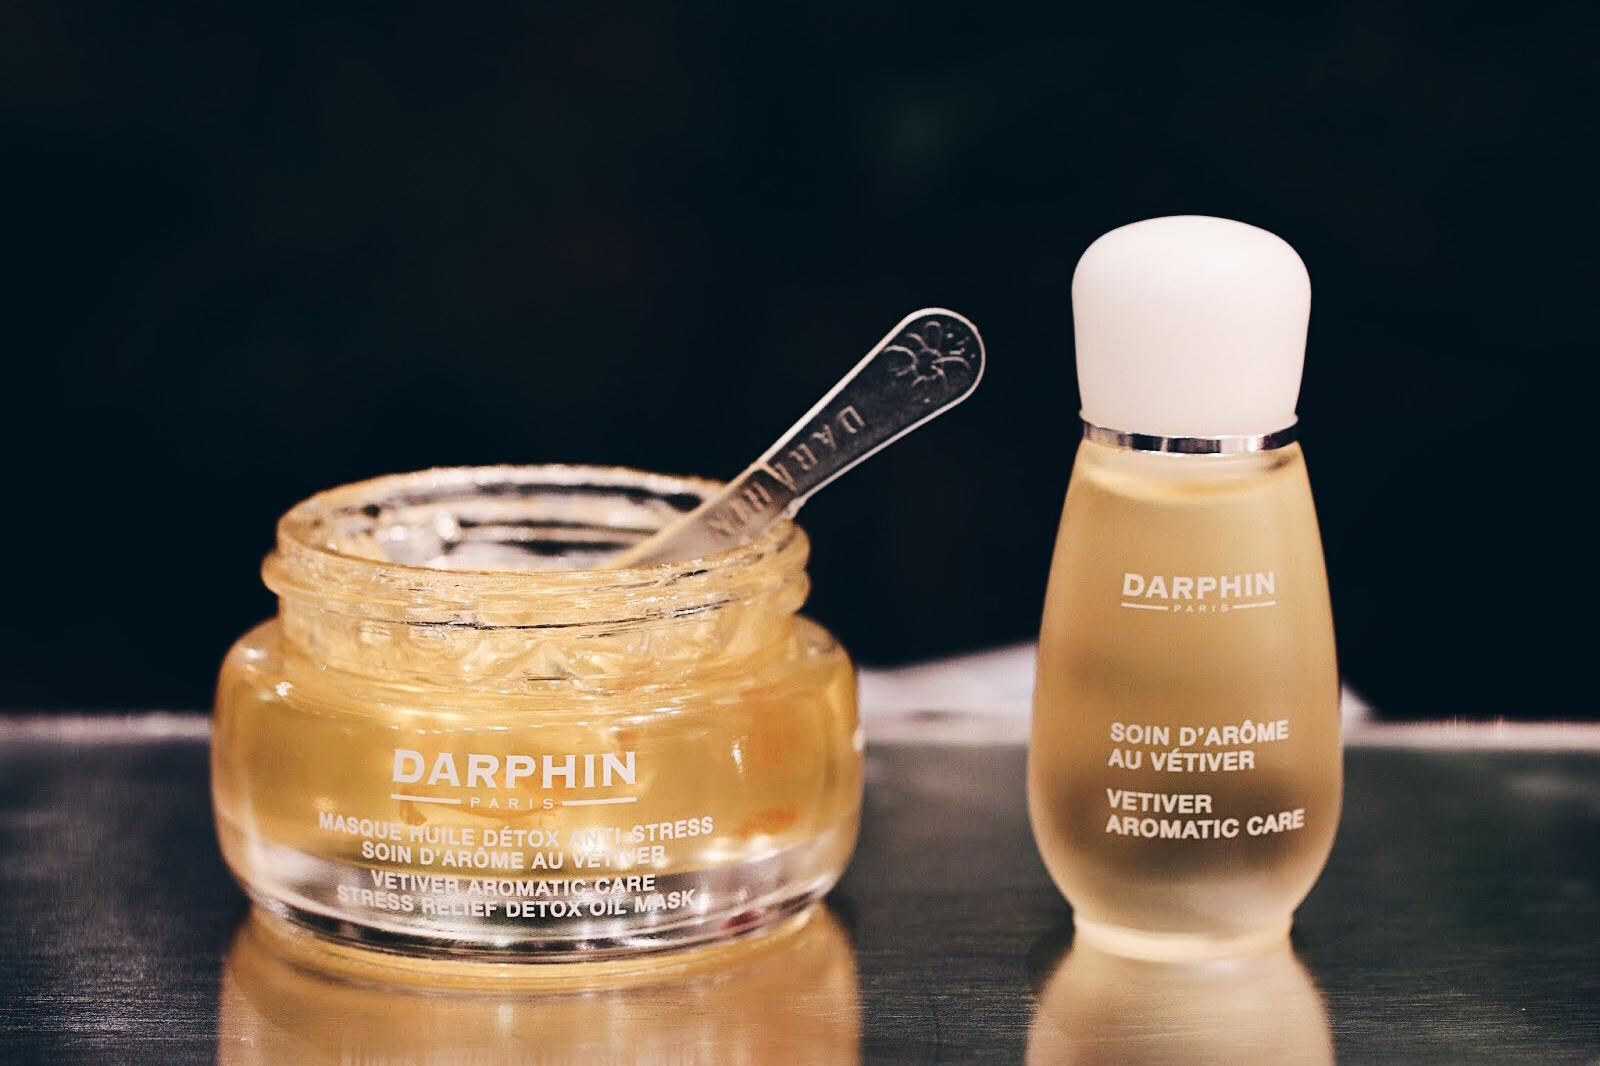 darphin masque huile detox soin d'arome vetiver